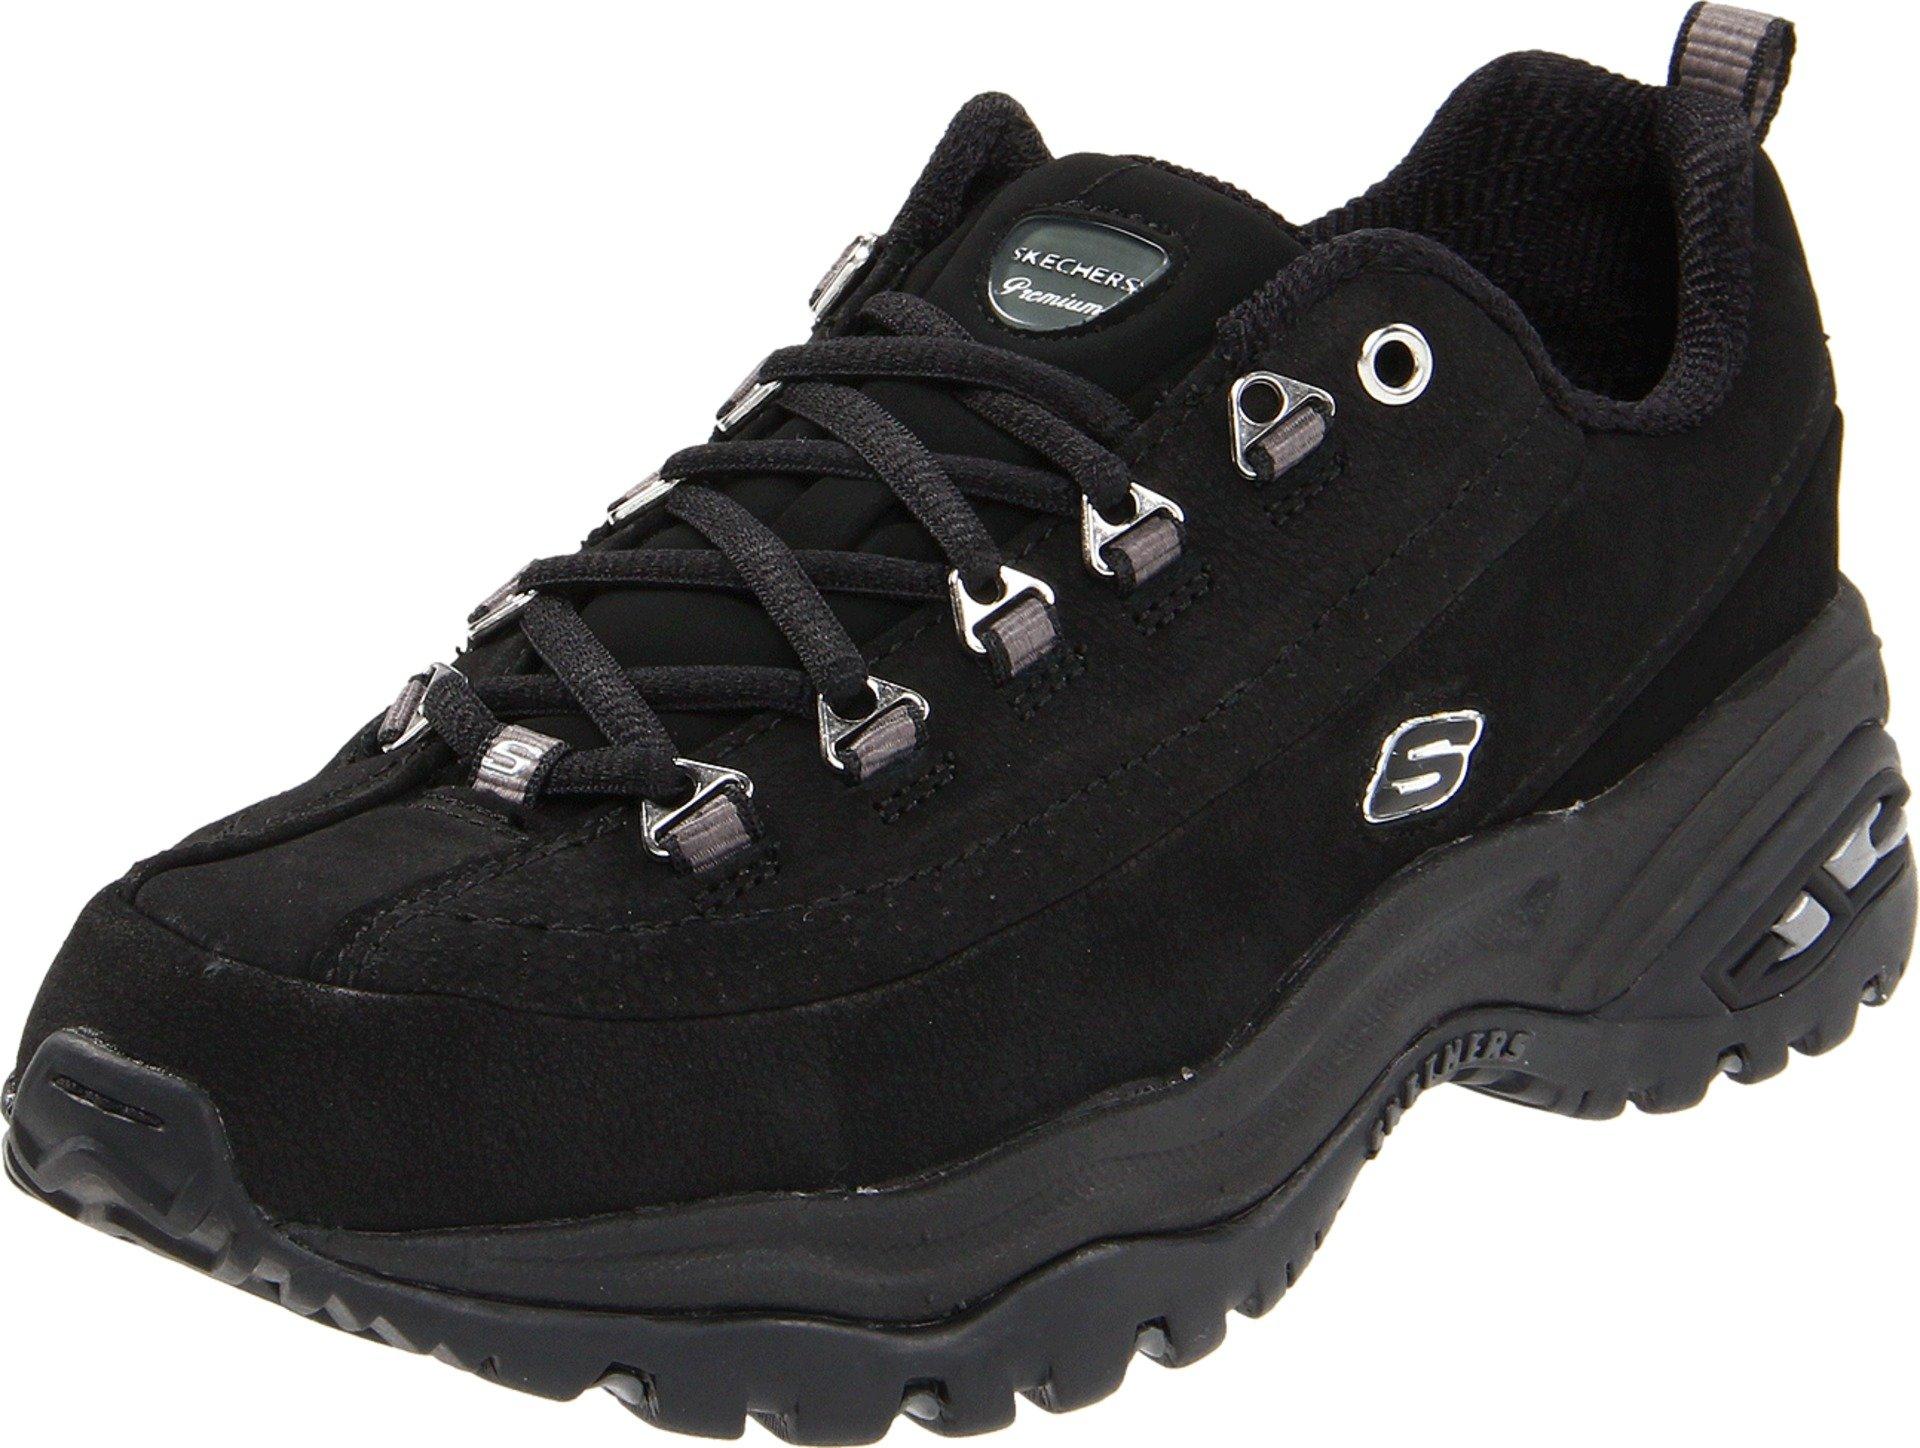 Skechers Sport Women's Premium-Nubuck Sneaker, Black Nubuck, 9 M US